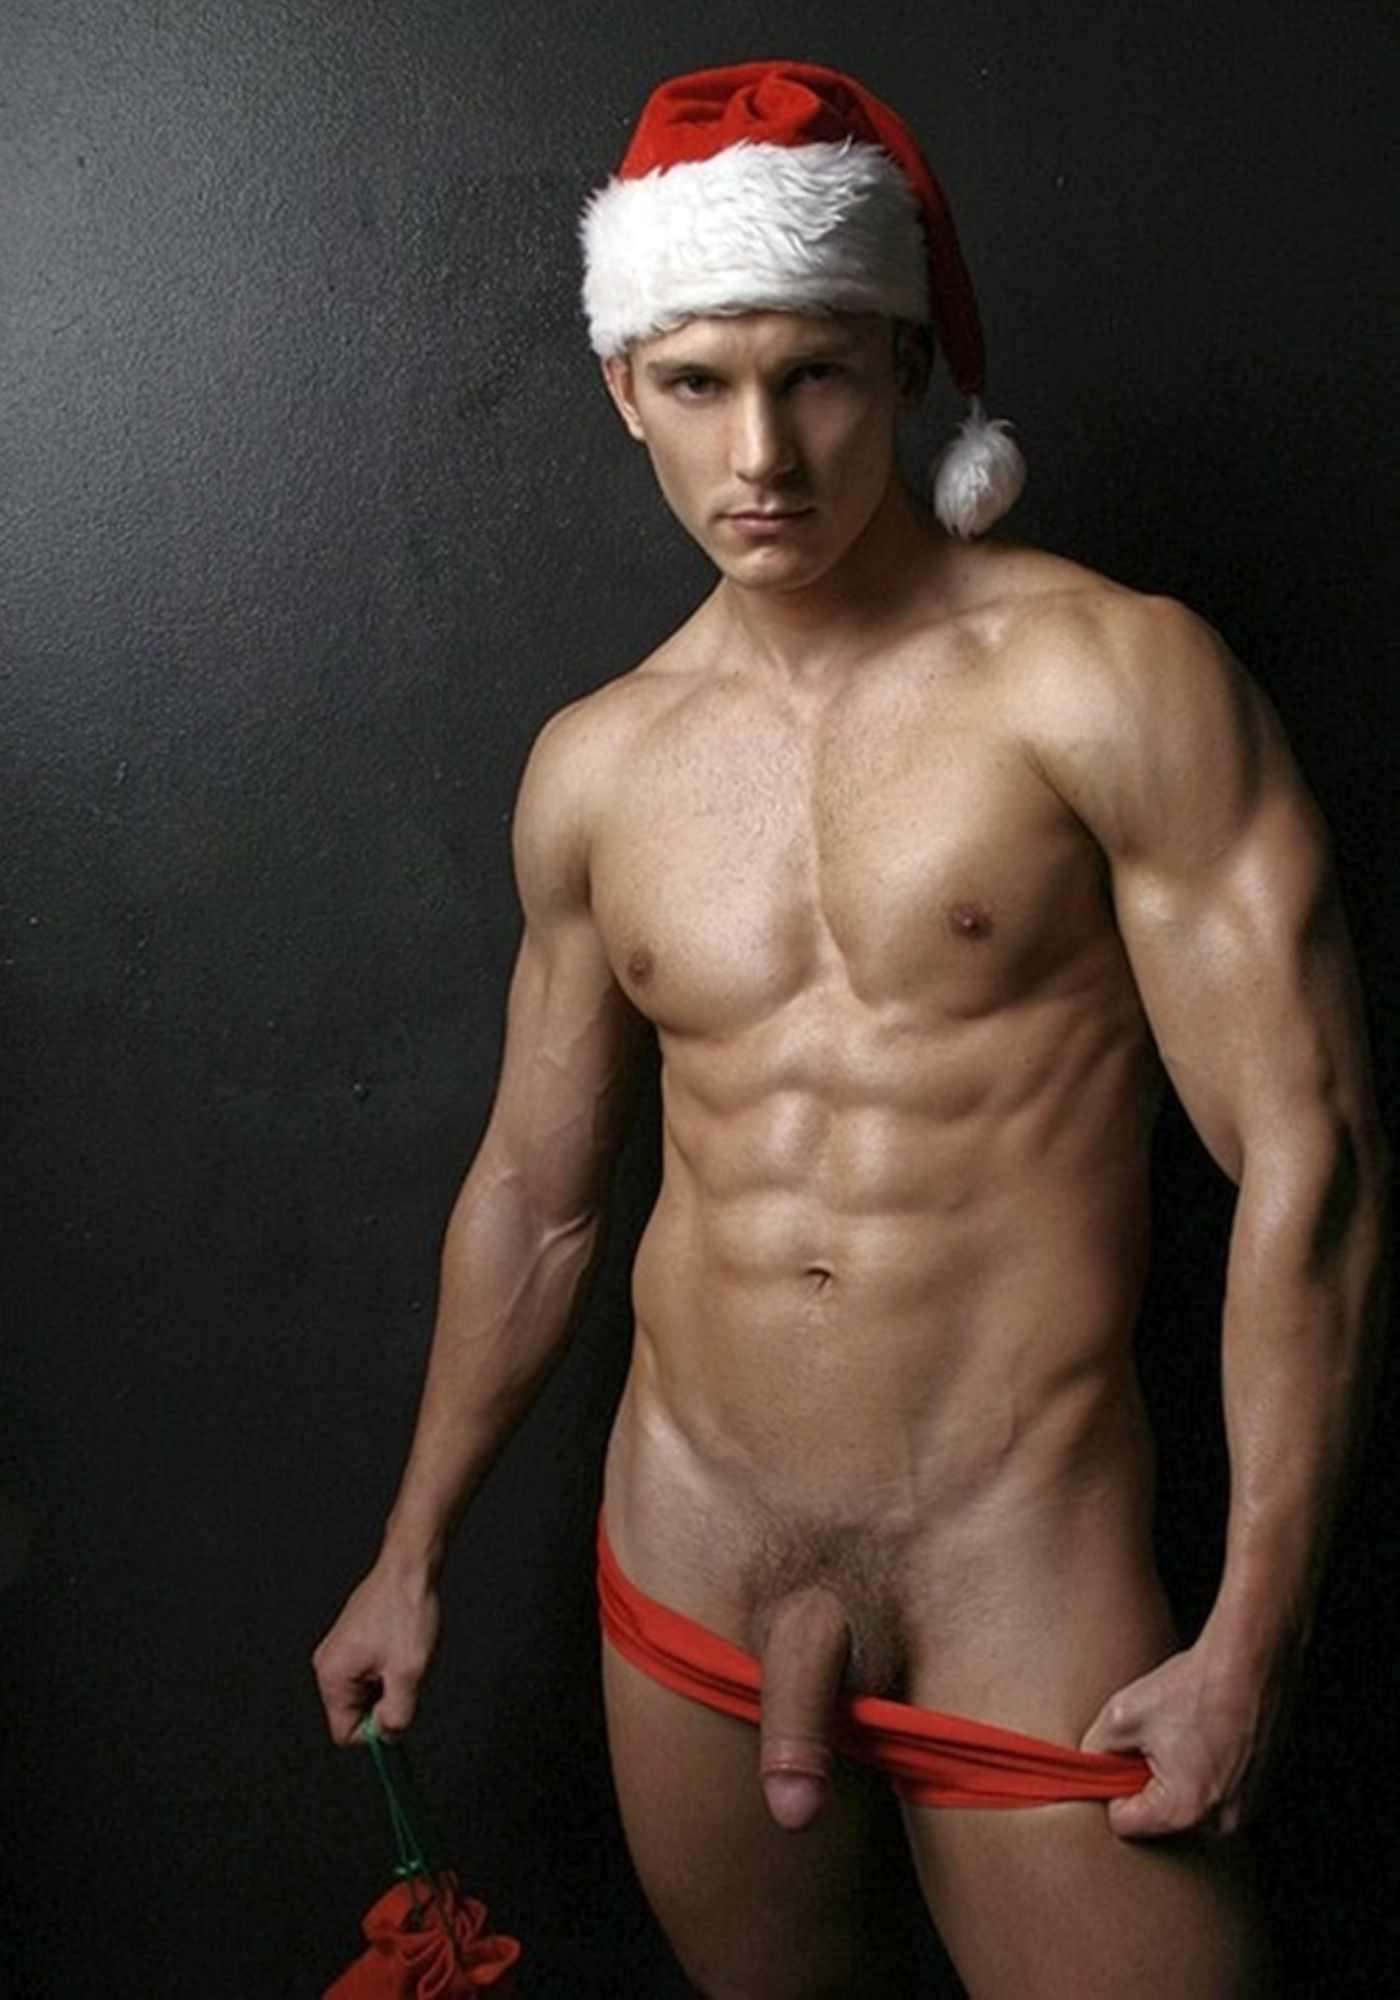 nude-men-santa-cum-porn-photos